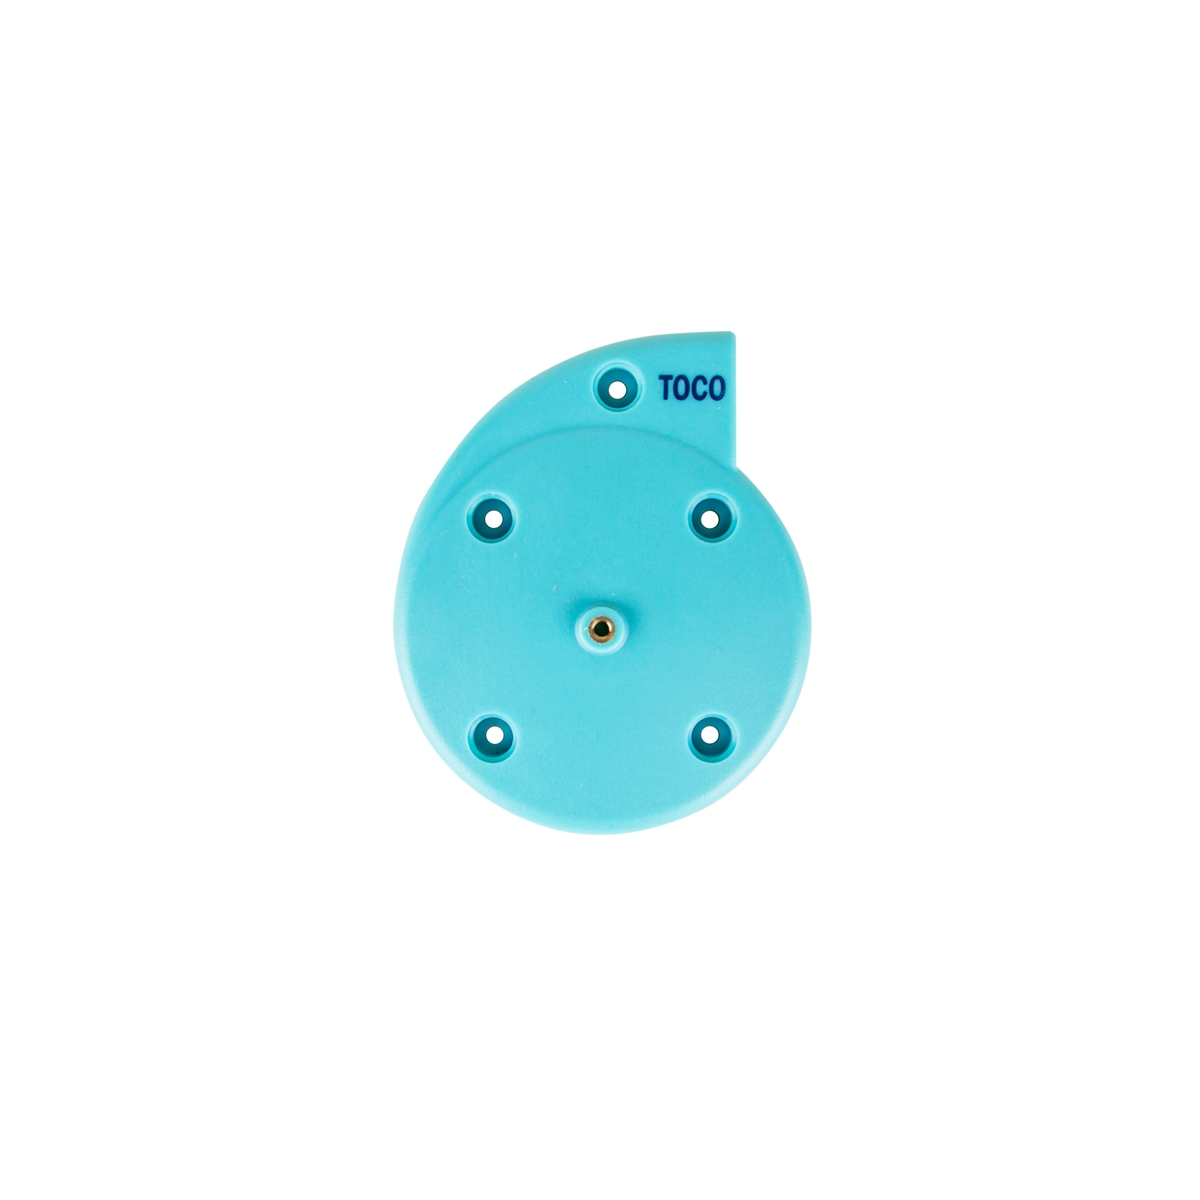 GE Corometrics Nautilus 2264HAX TOCO Transducer Top Case Cover With Knob